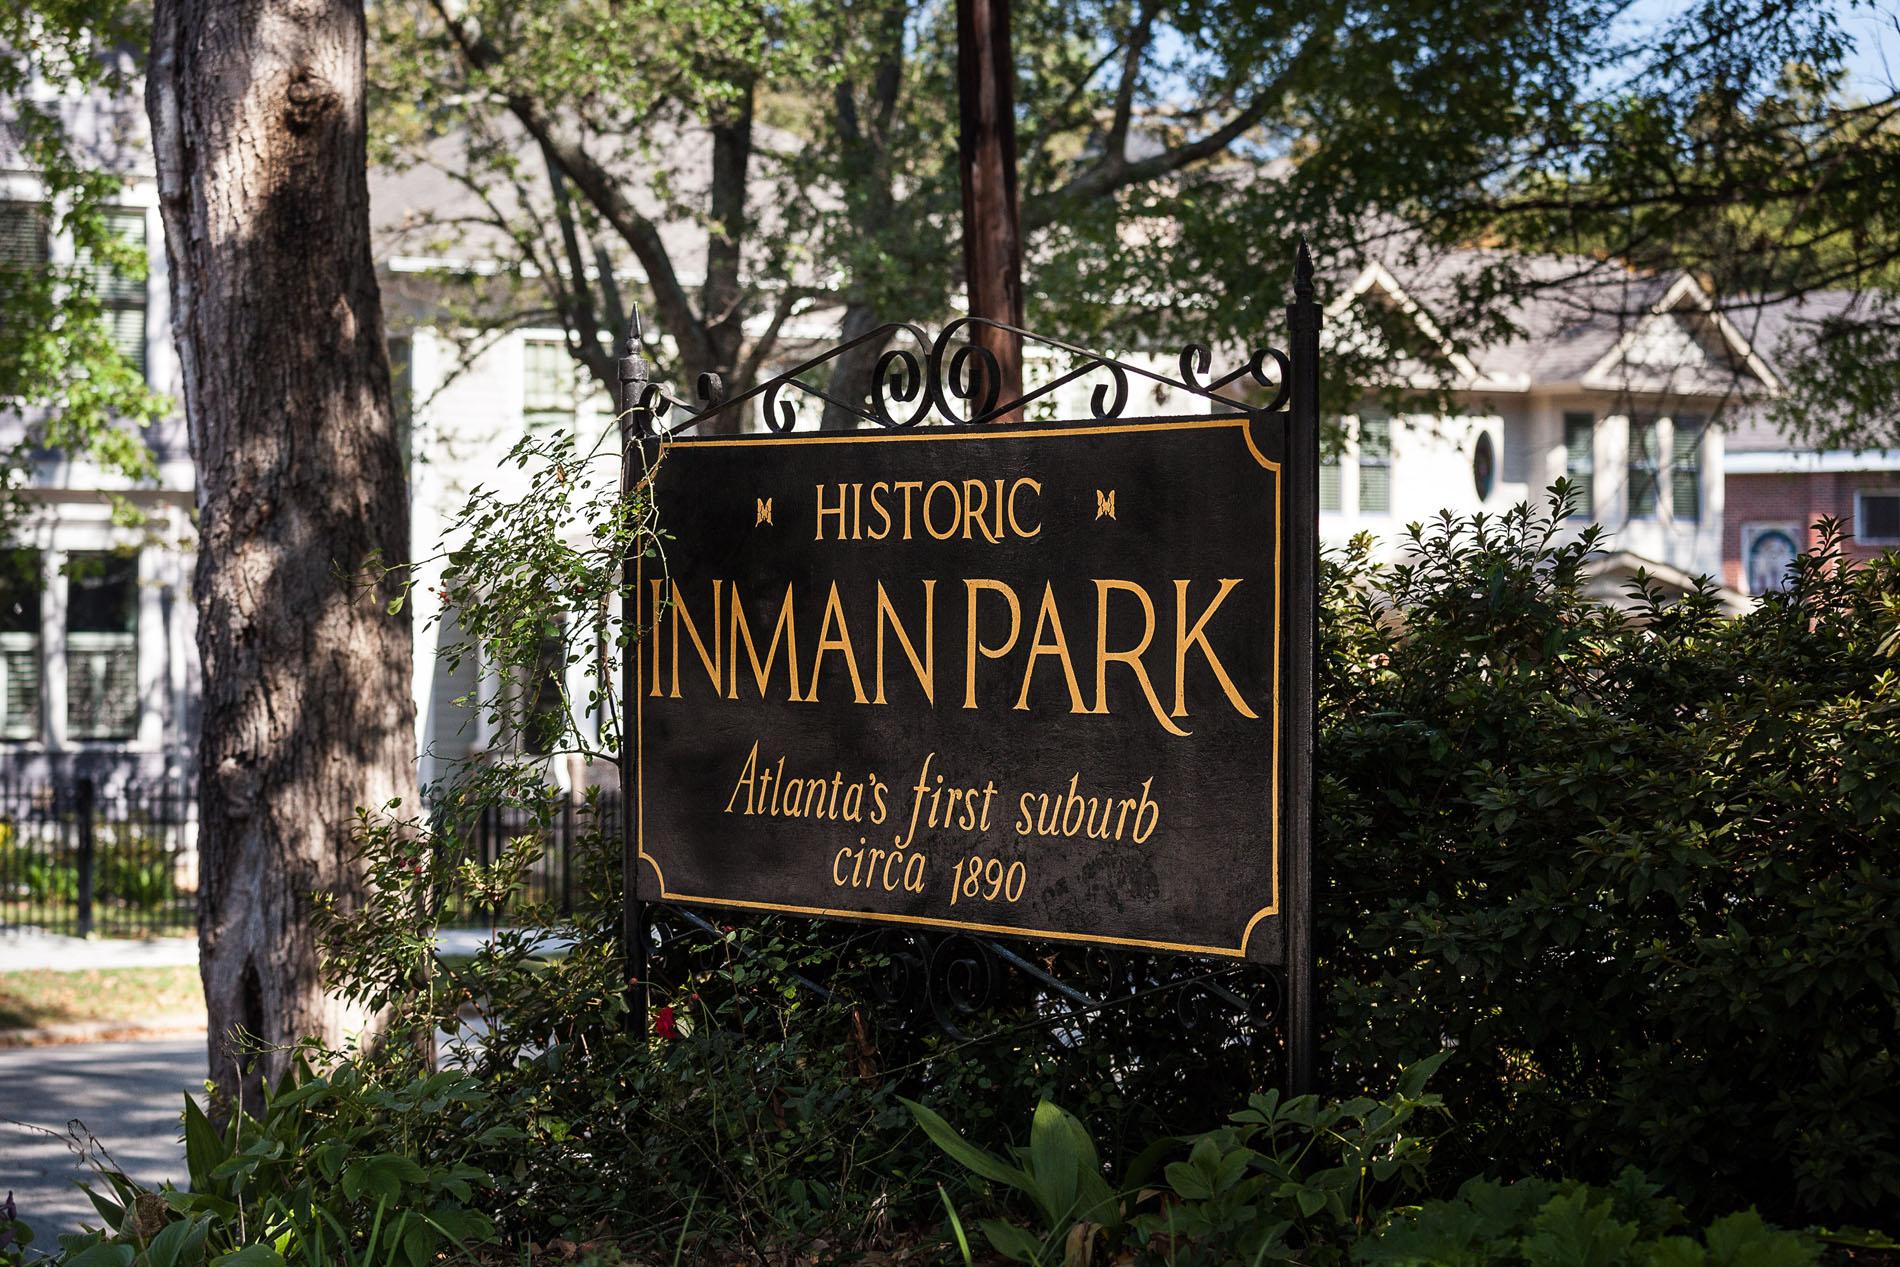 Inman Park